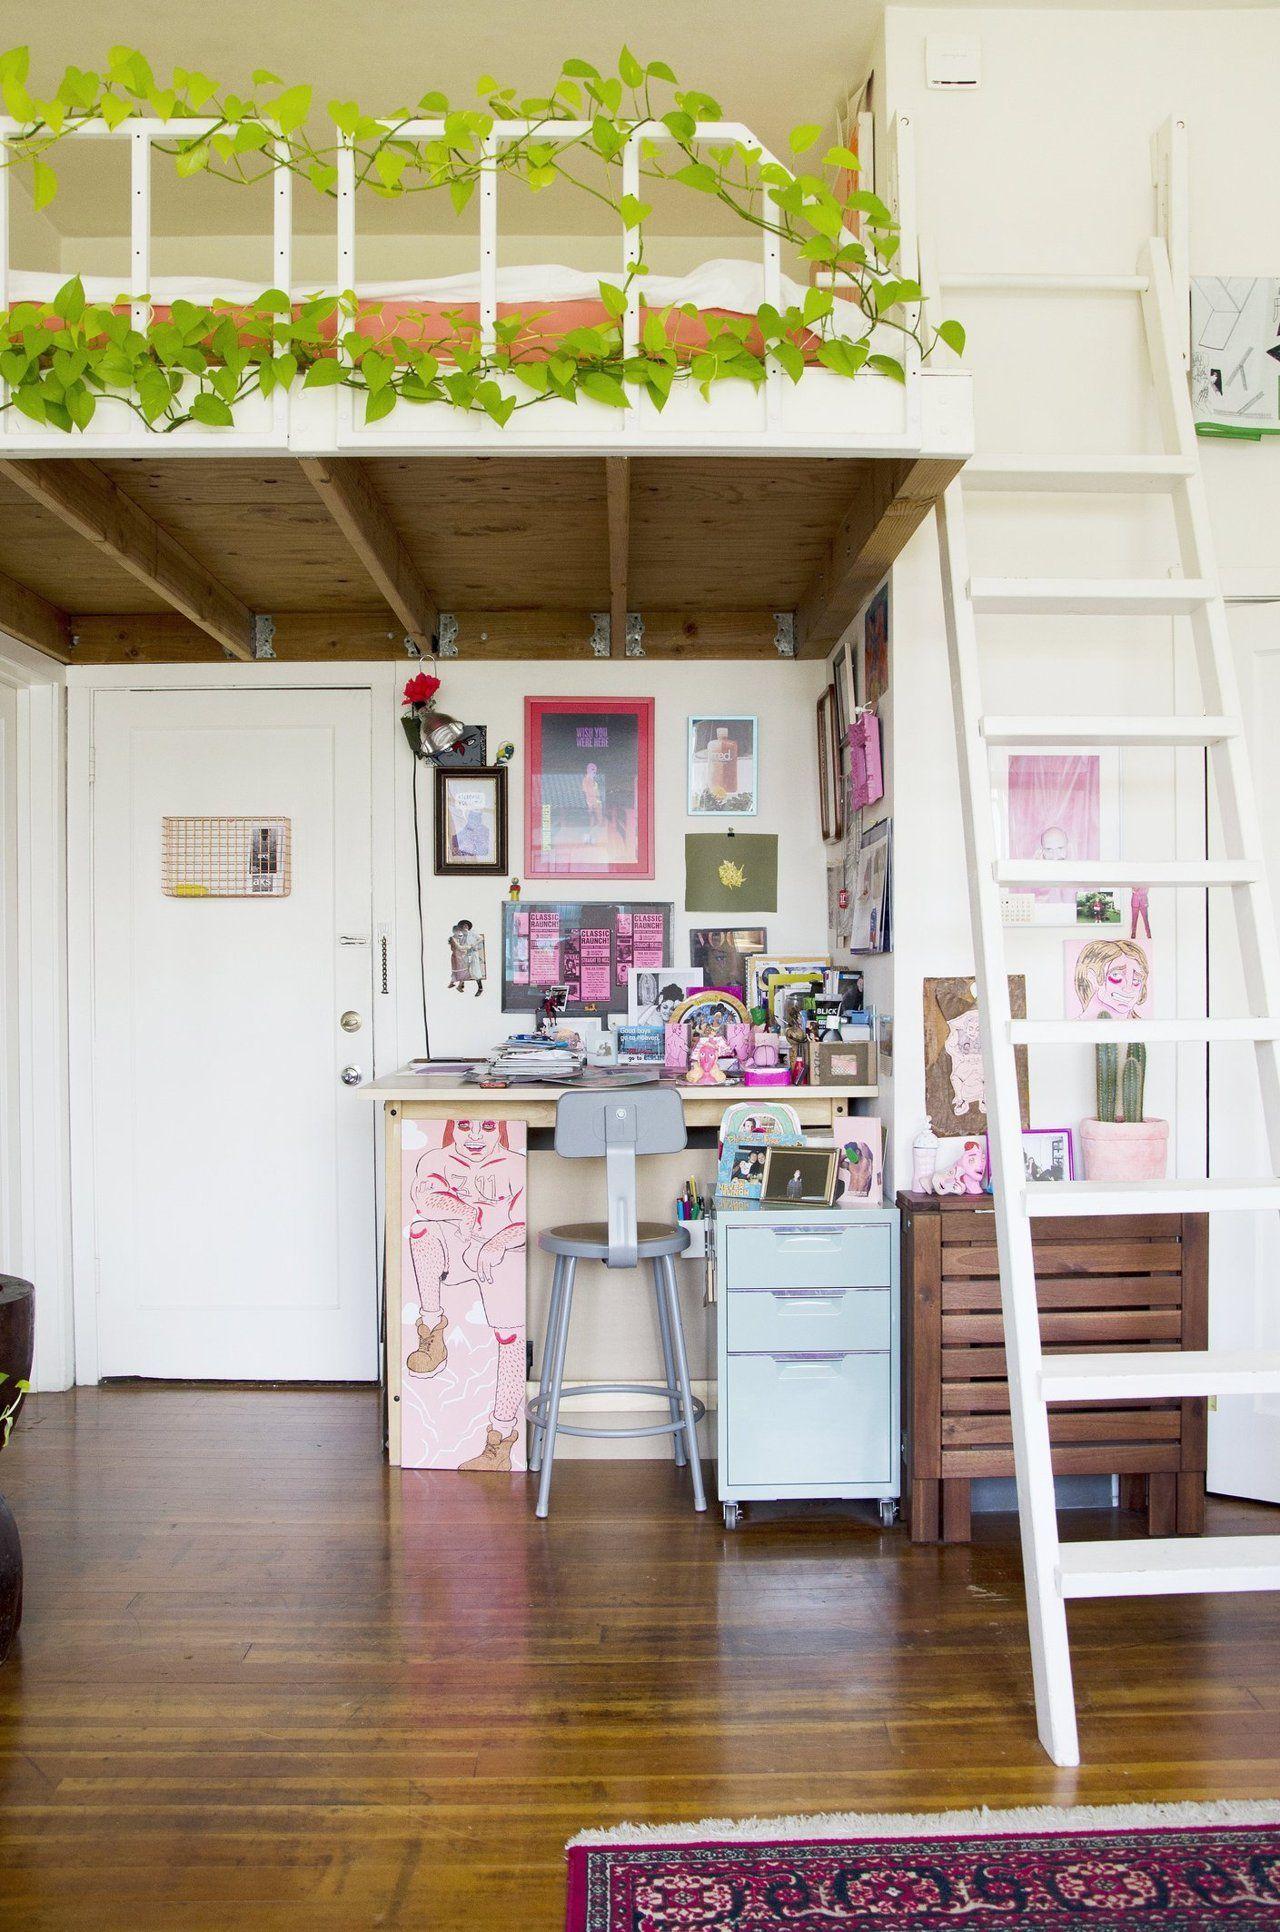 Loft bed decorating ideas  Joe u Keith Share a Tiny u Inviting Oakland Studio  Studio Lofts